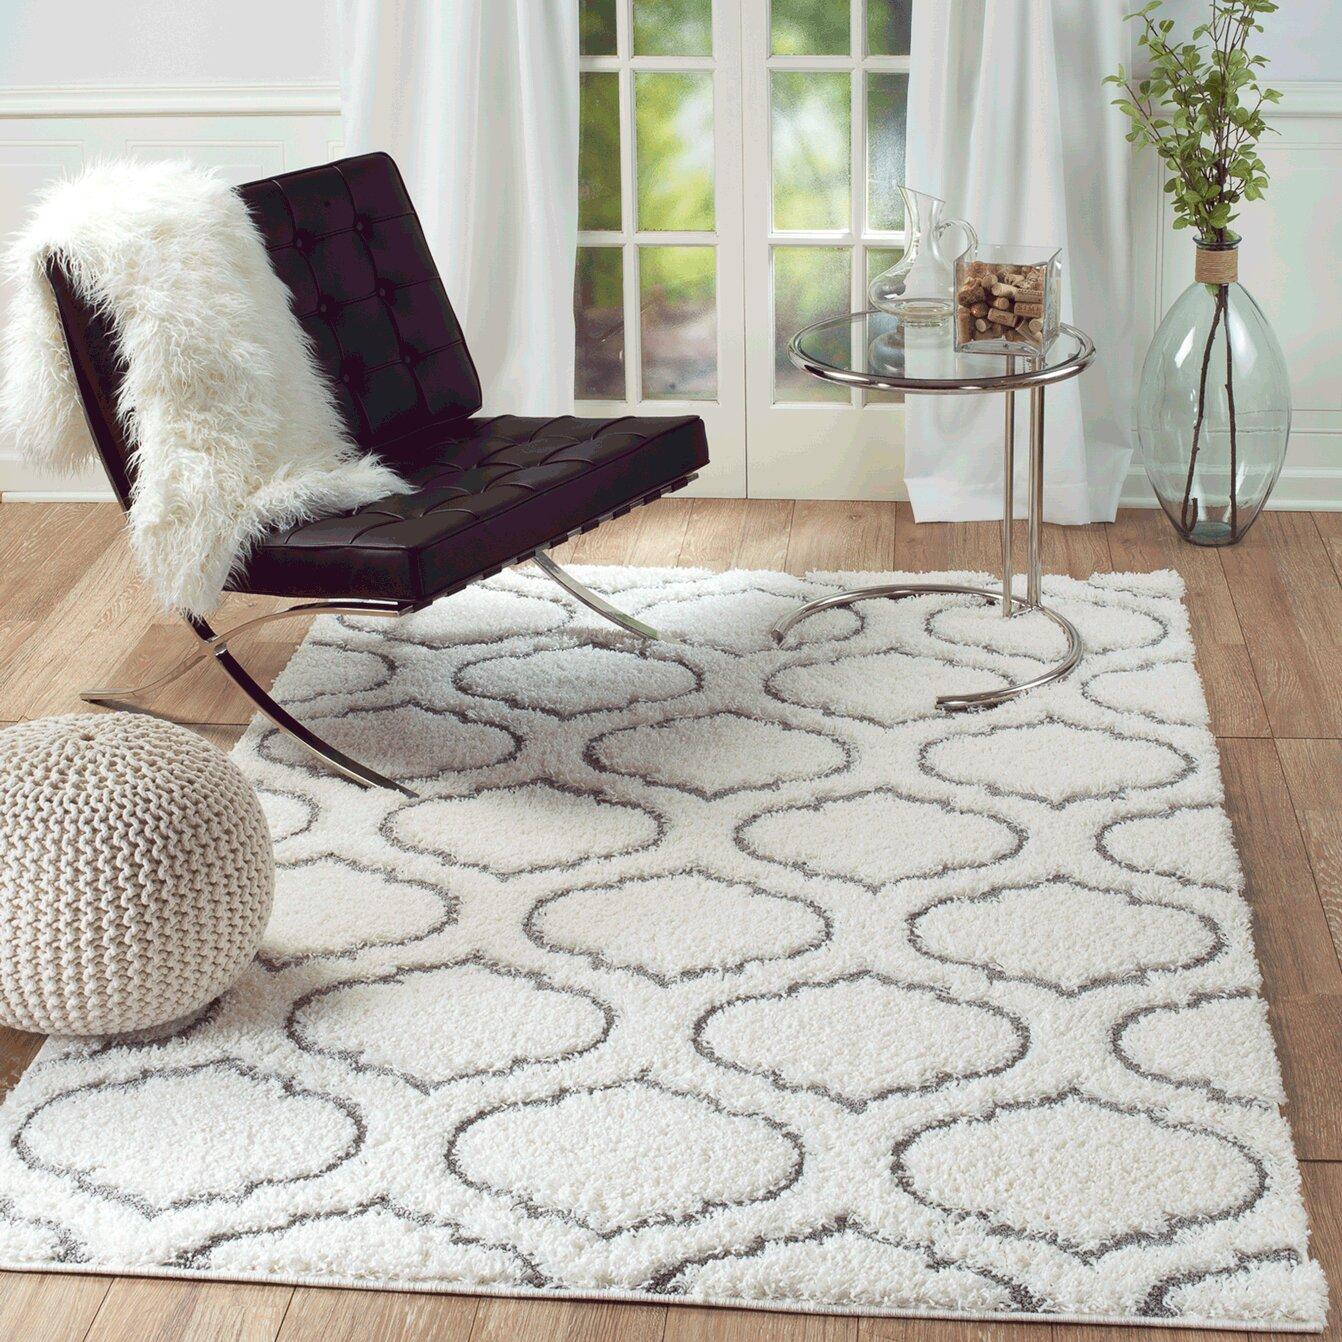 White Living Room Rug Rug And Decor Inc Lorena White Area Rug Reviews Wayfair